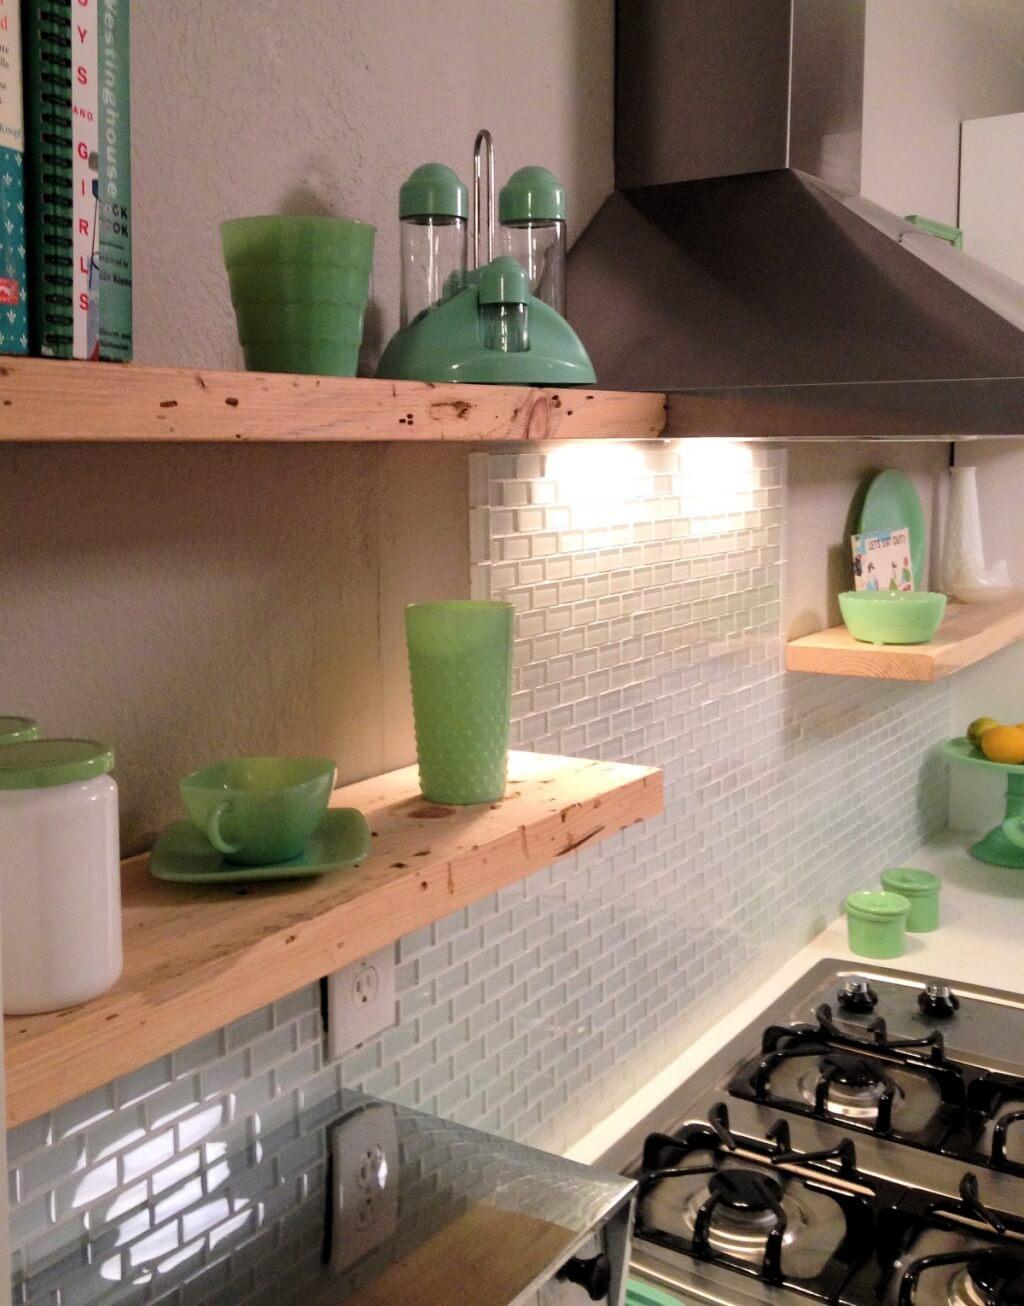 Contemporary subway tile kitchen splashback